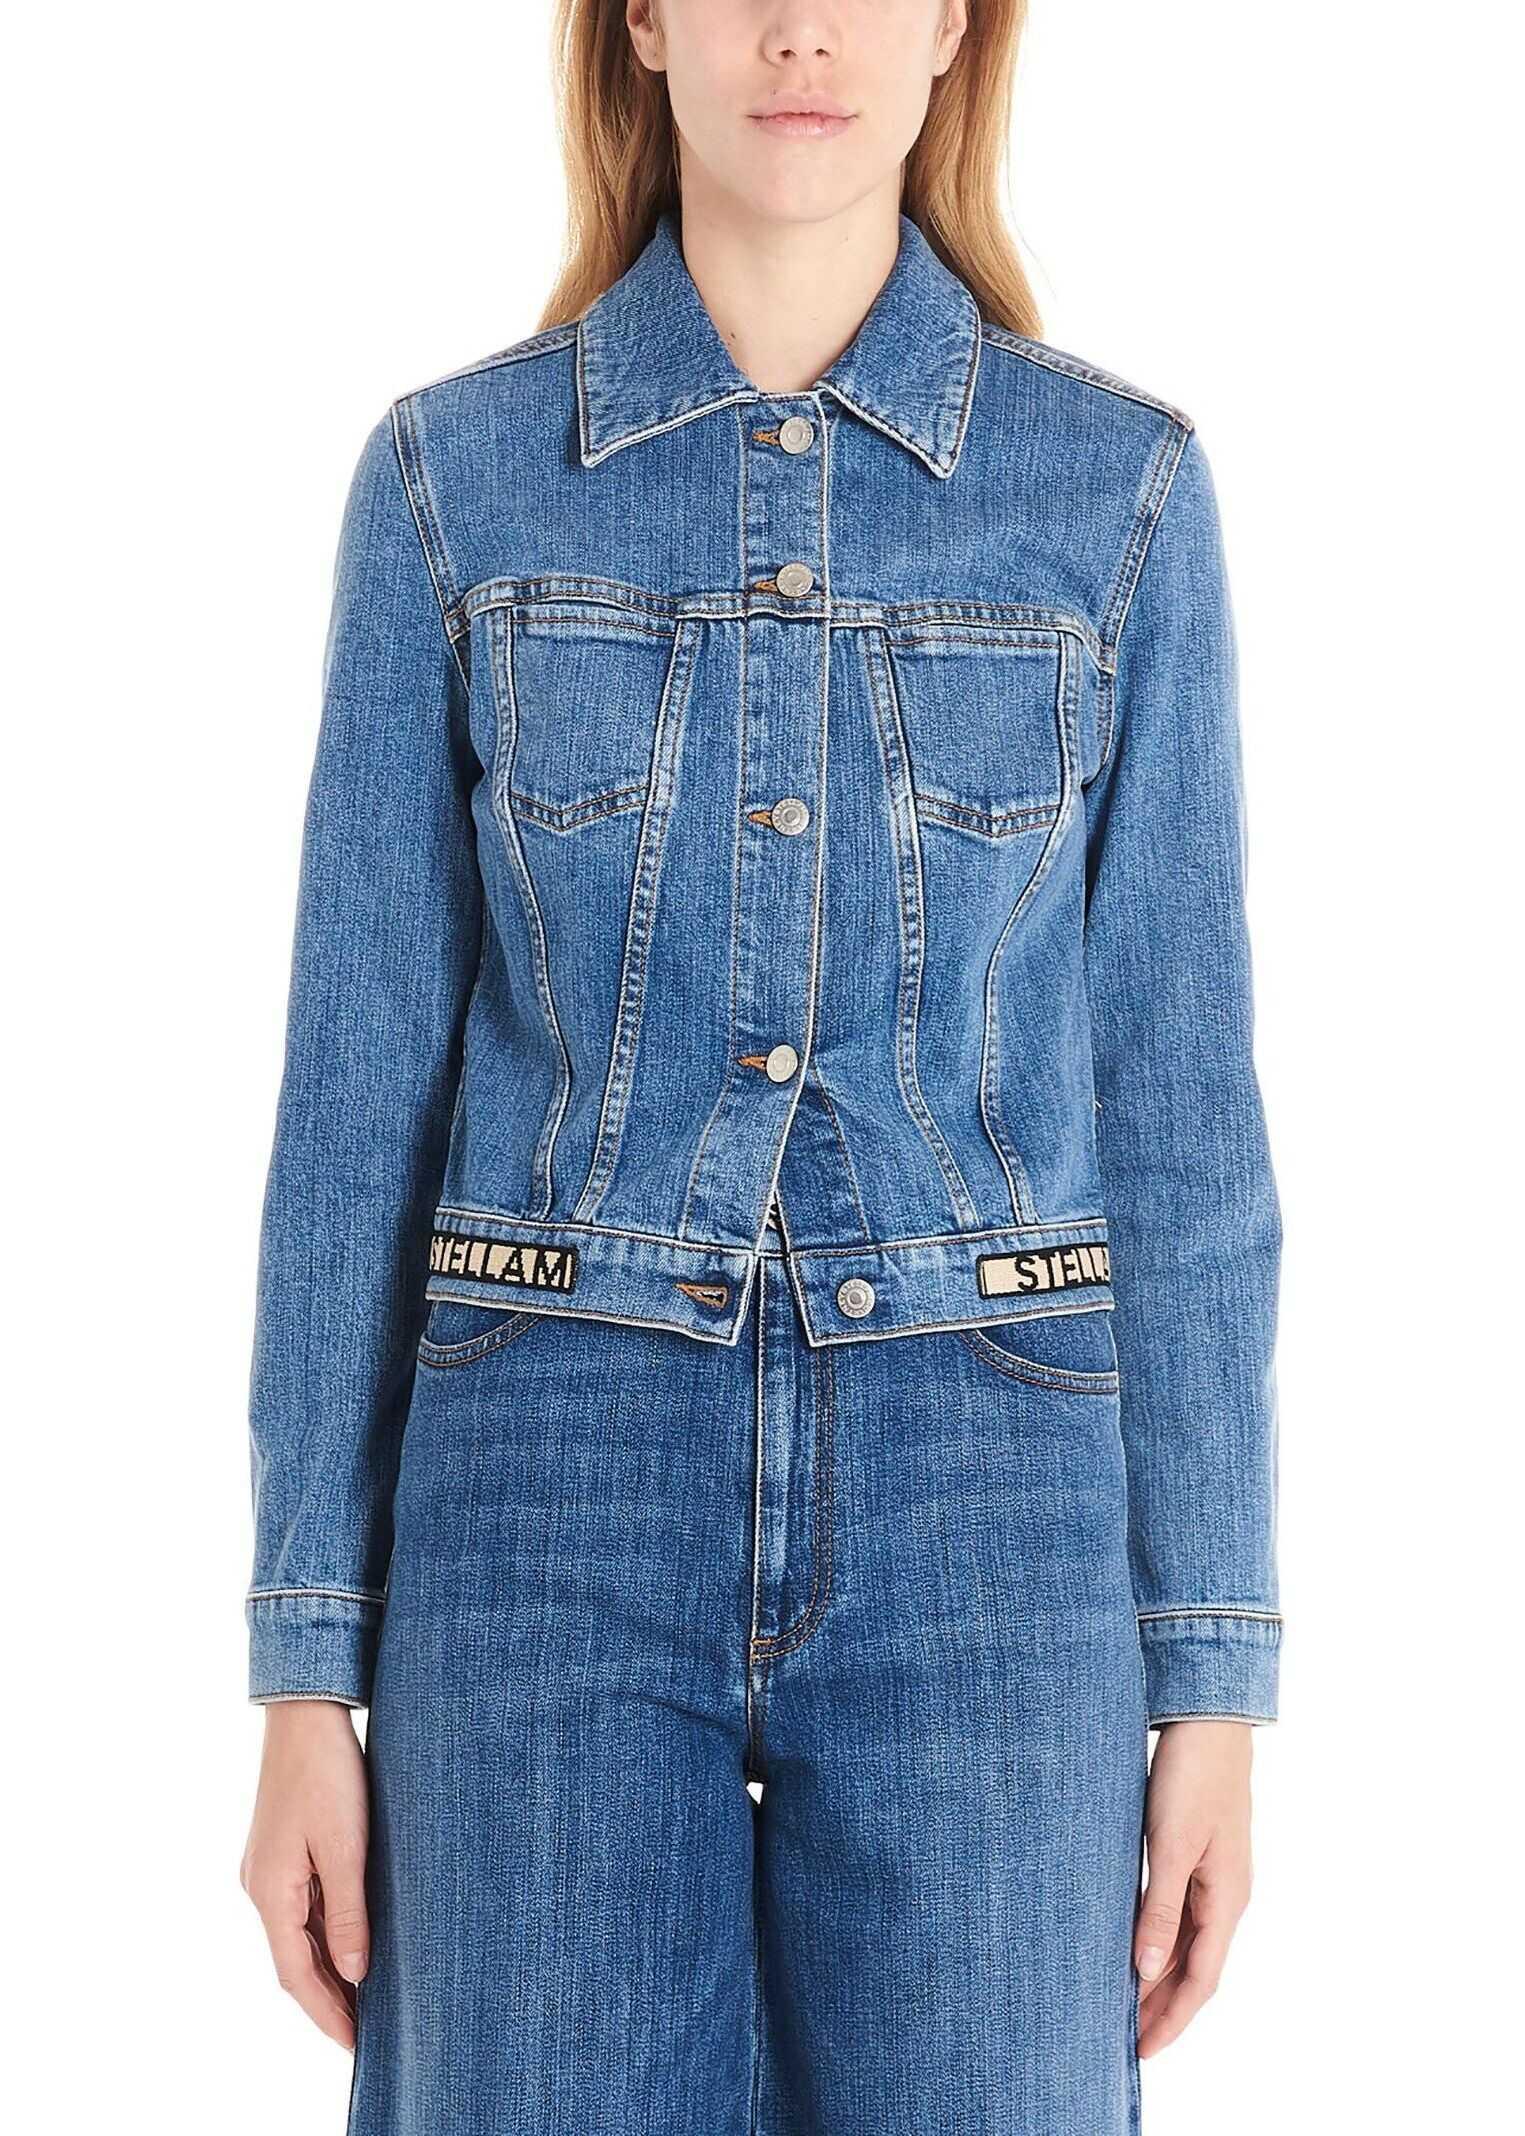 adidas by Stella McCartney Cotton Jacket BLUE